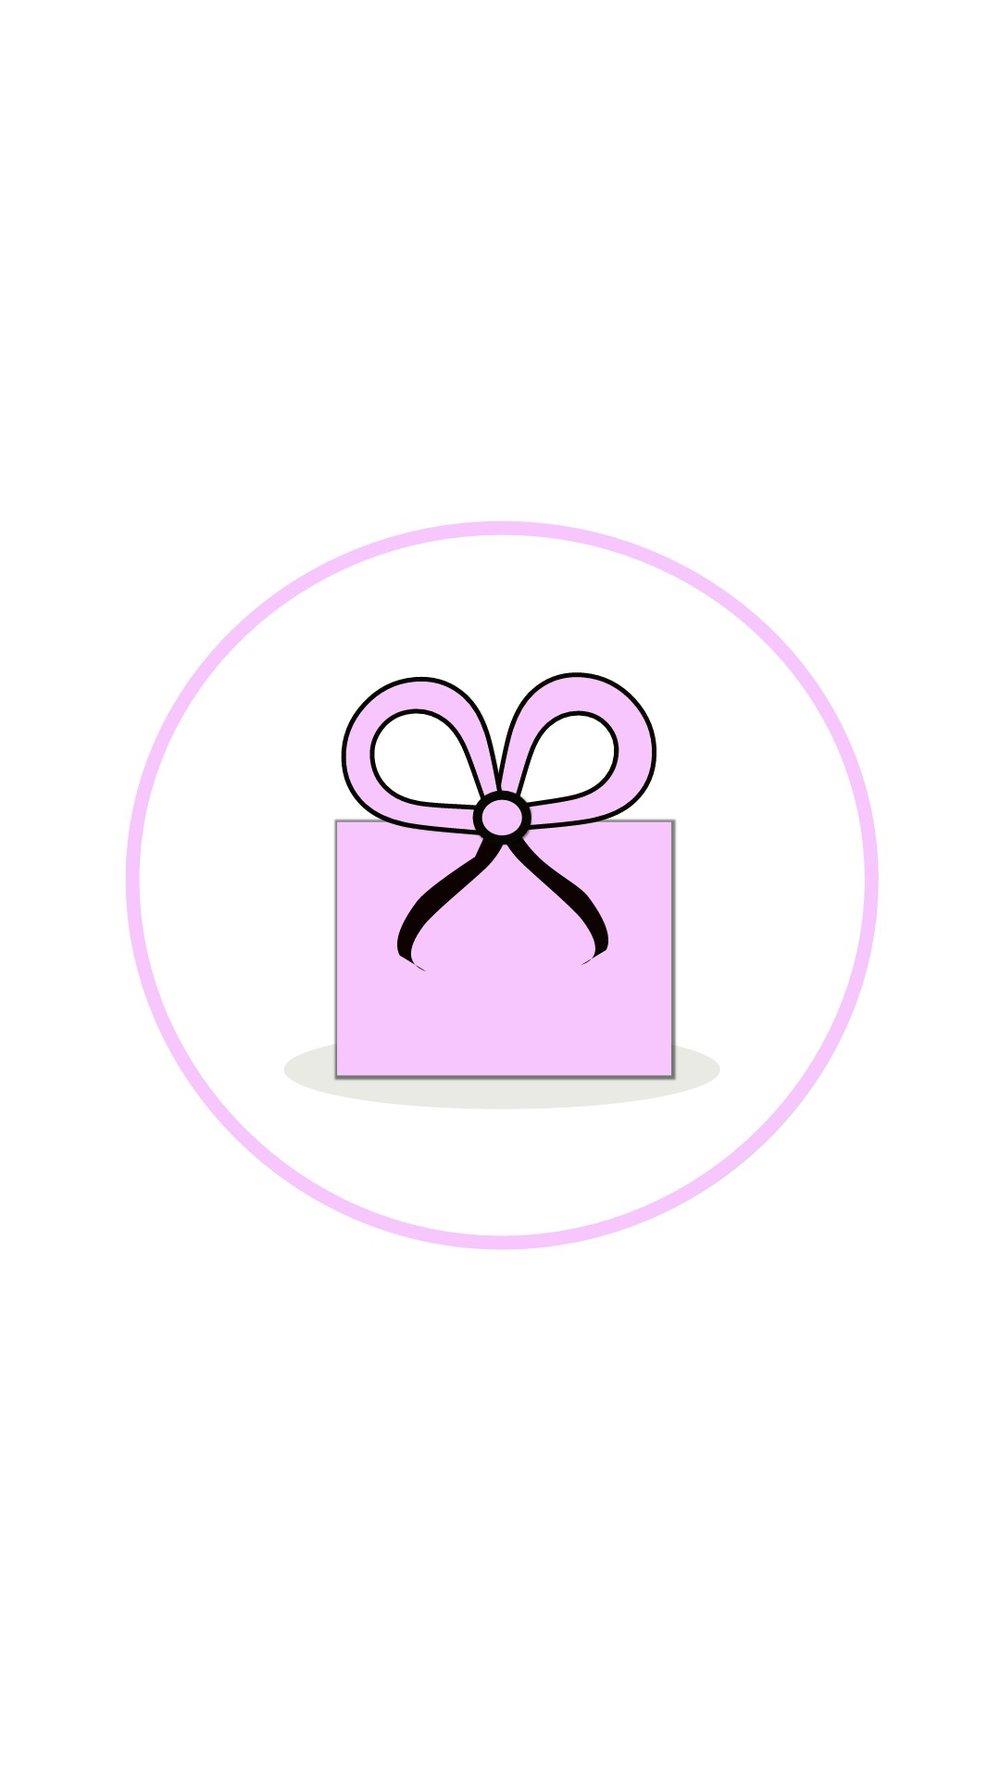 Instagram-cover-box-pink-white-lotnotes.com.jpg